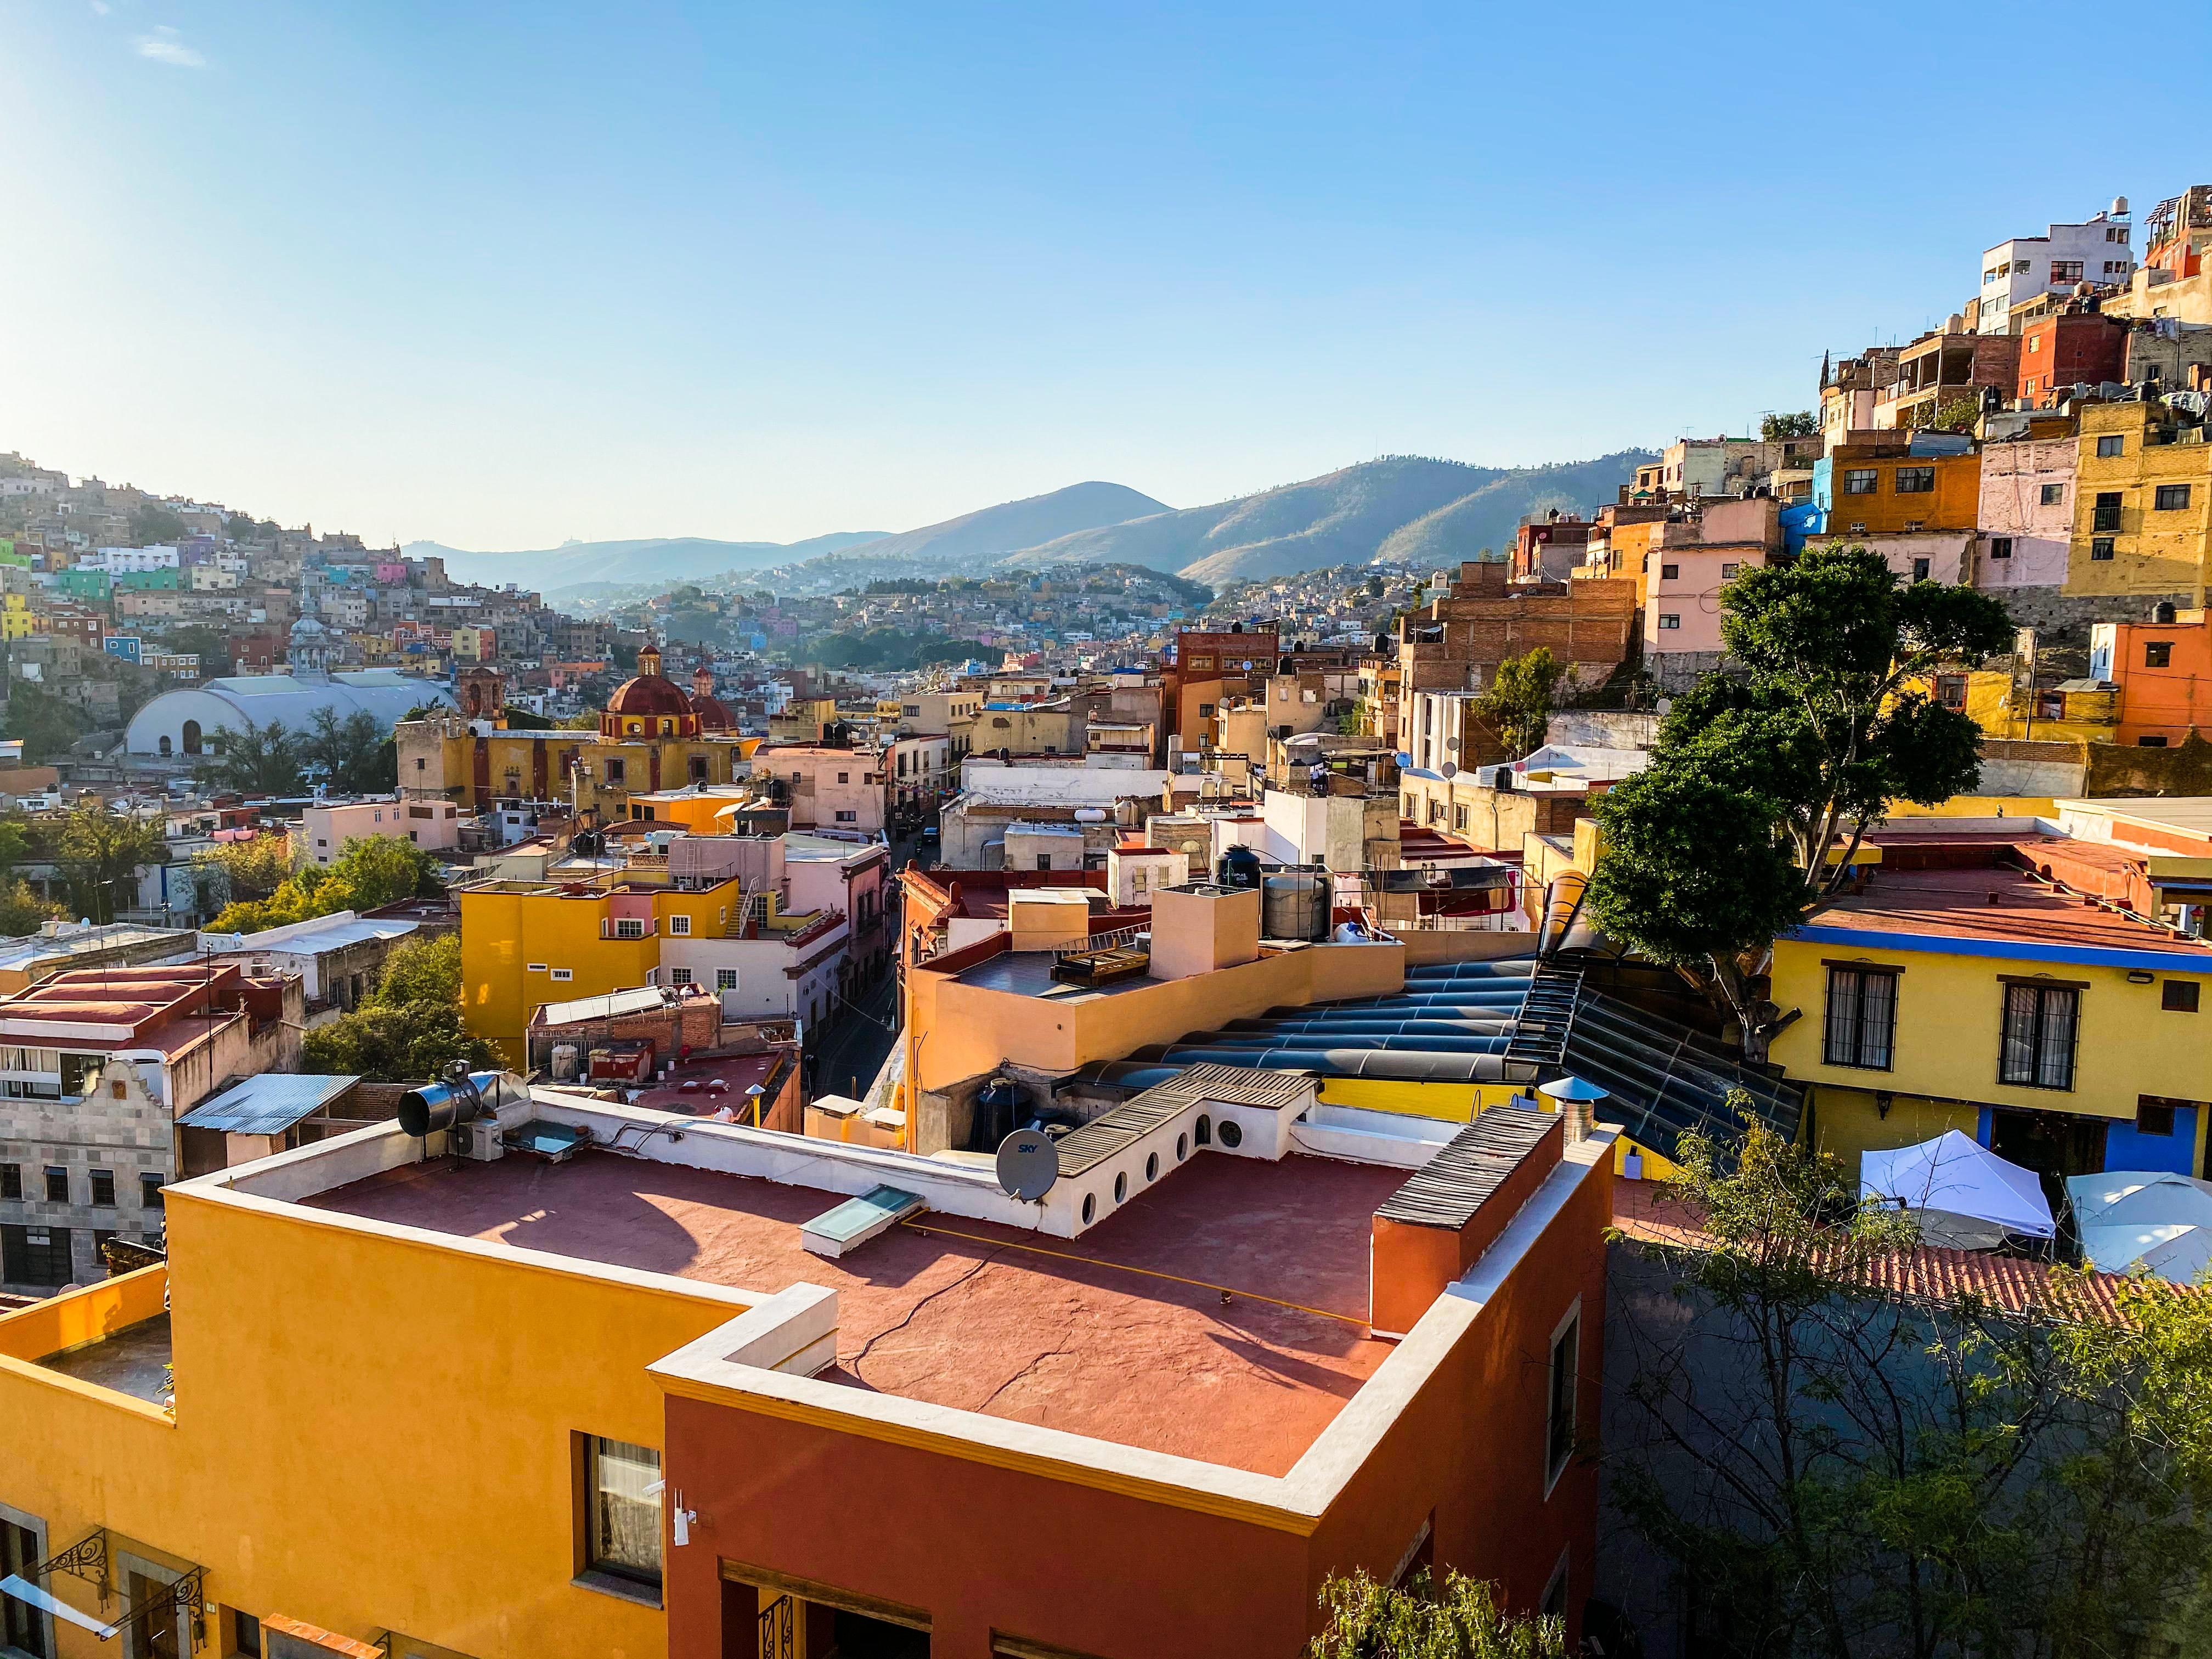 Guanajuato Photo by Jorge Gardner